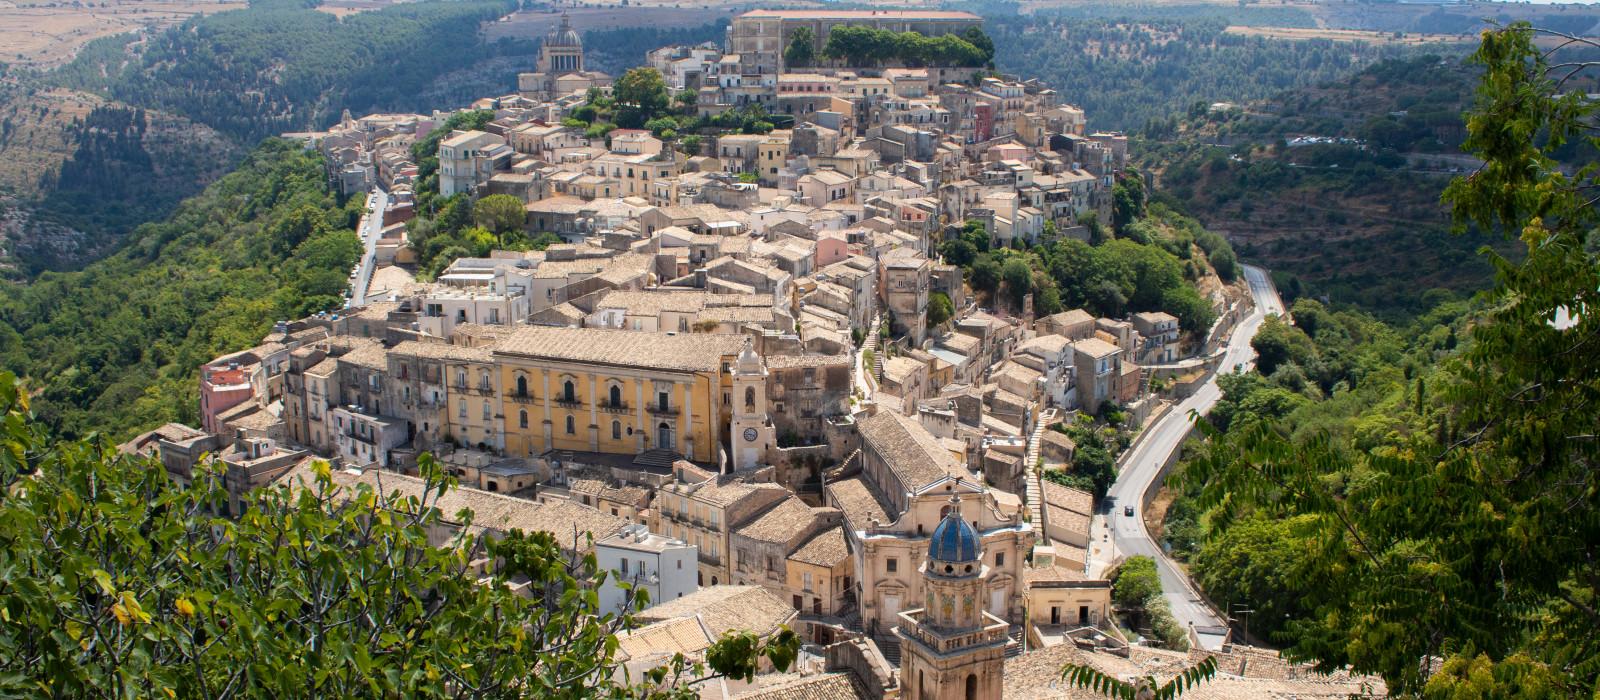 Reiseziel Ragusa Italien